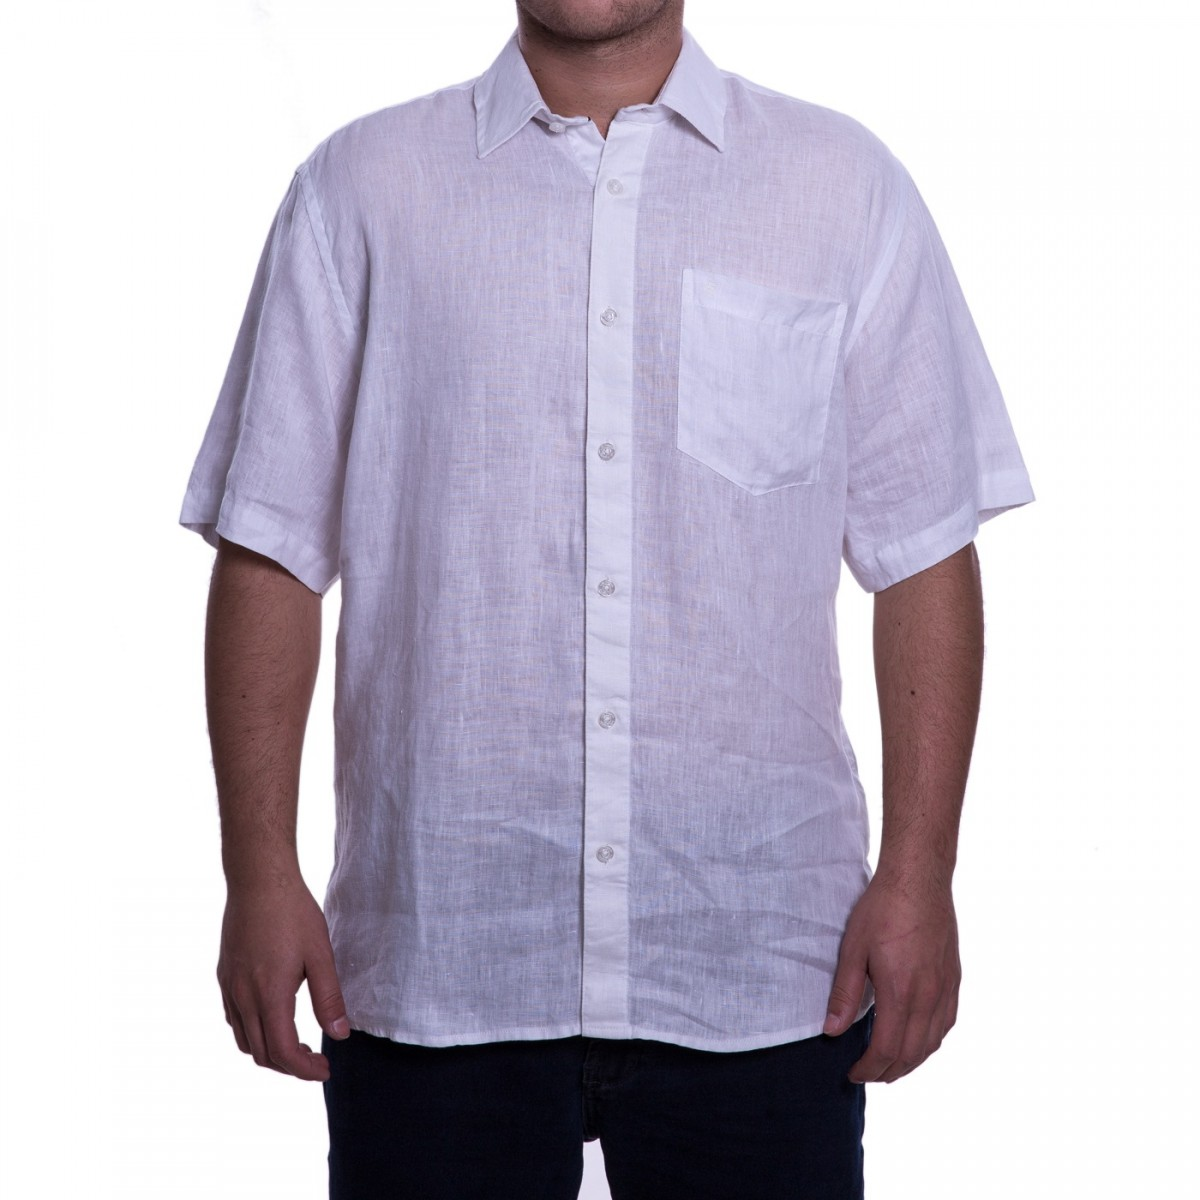 0d9858922 Bizz Store - Camisa Masculina Luiz Eugenio Linho Manga Curta